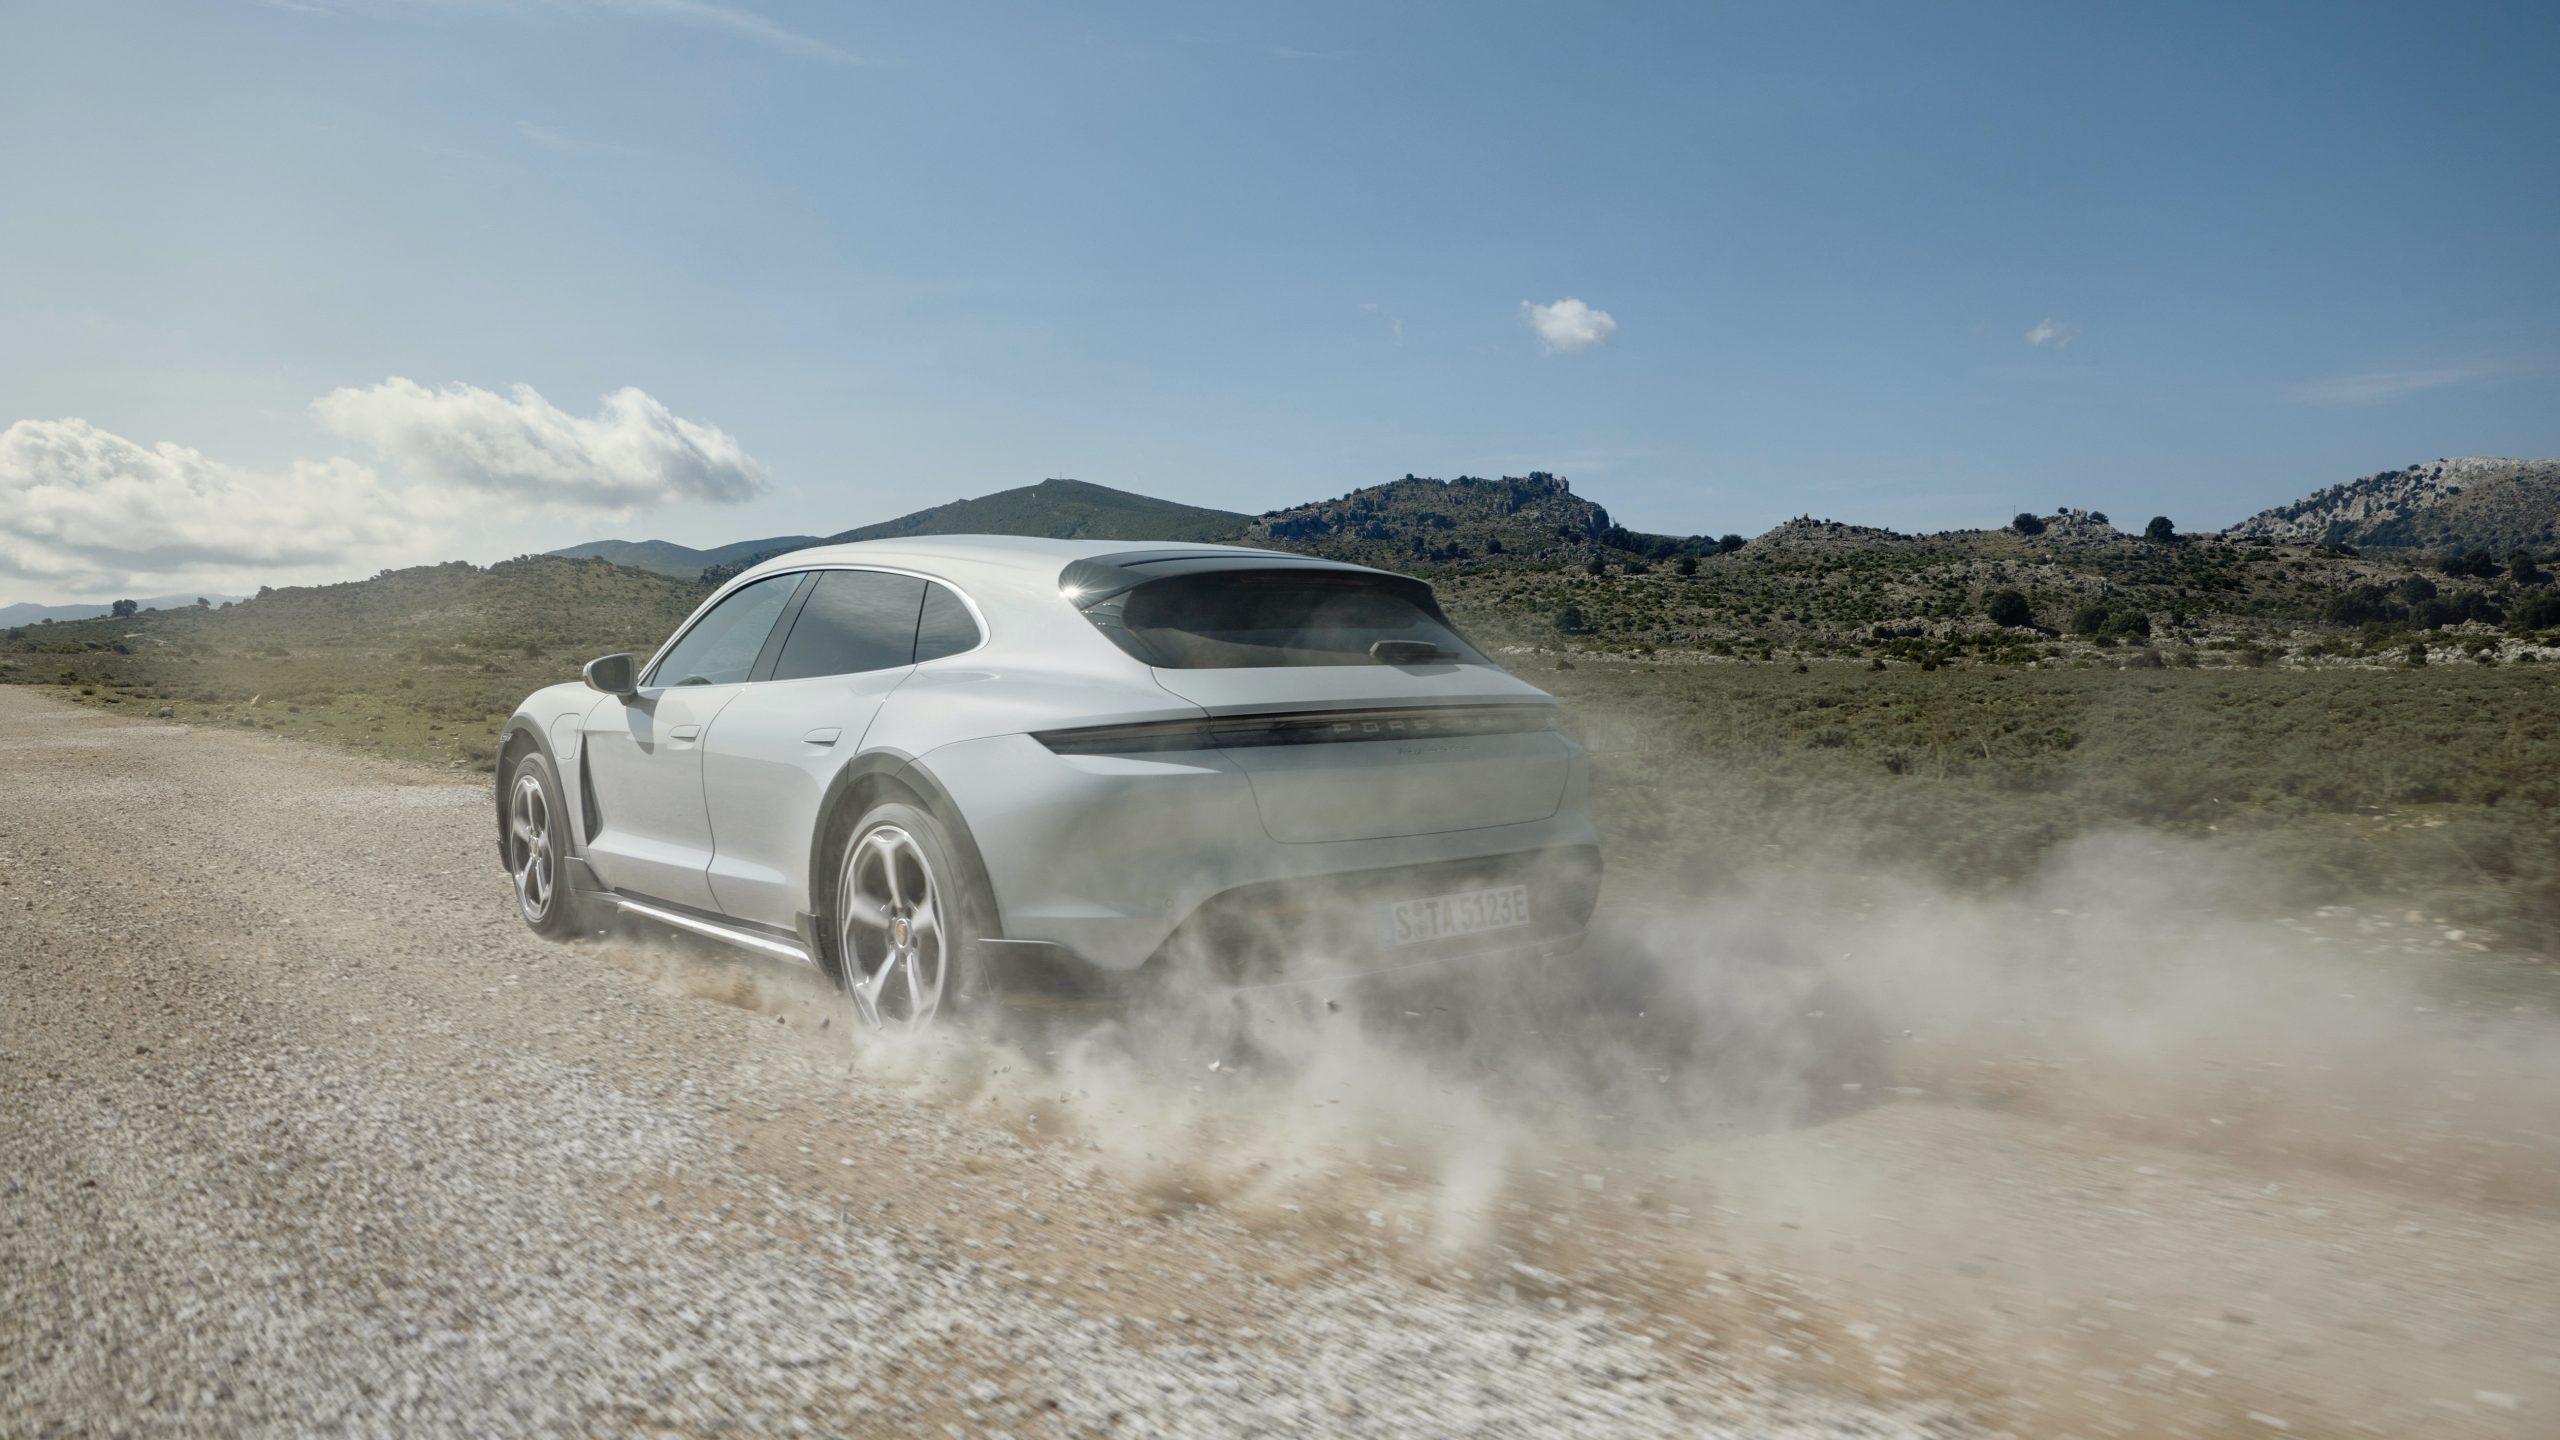 2021 Porsche Taycan Cross Tursimo